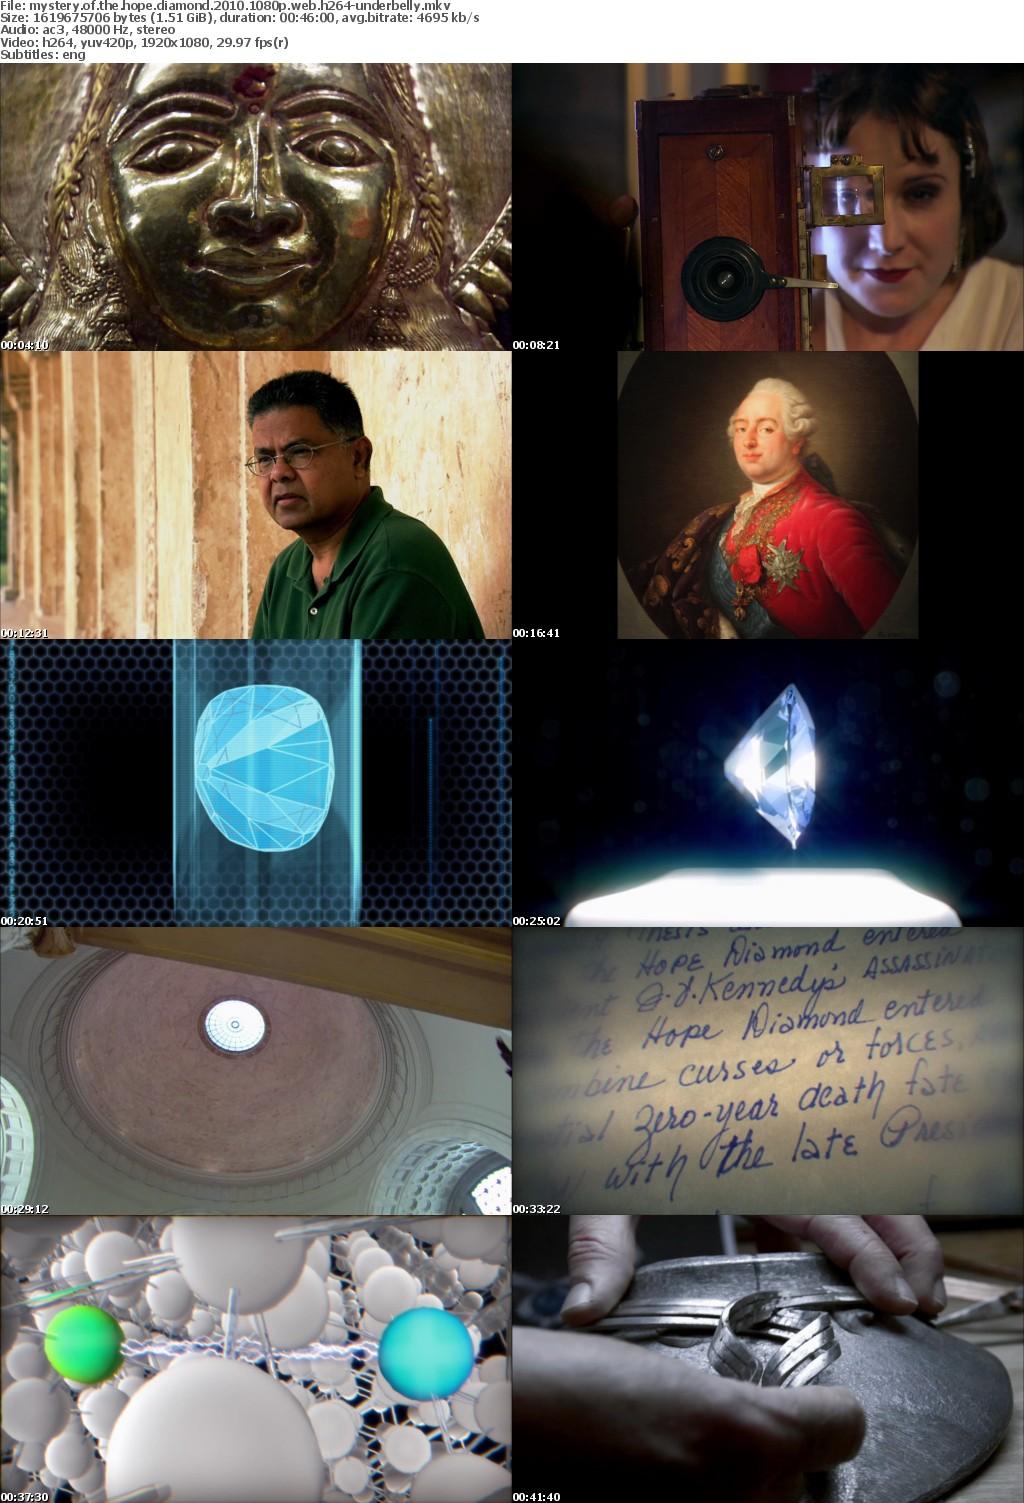 mystery of the hope diamond 2010 1080p web h264-underbelly